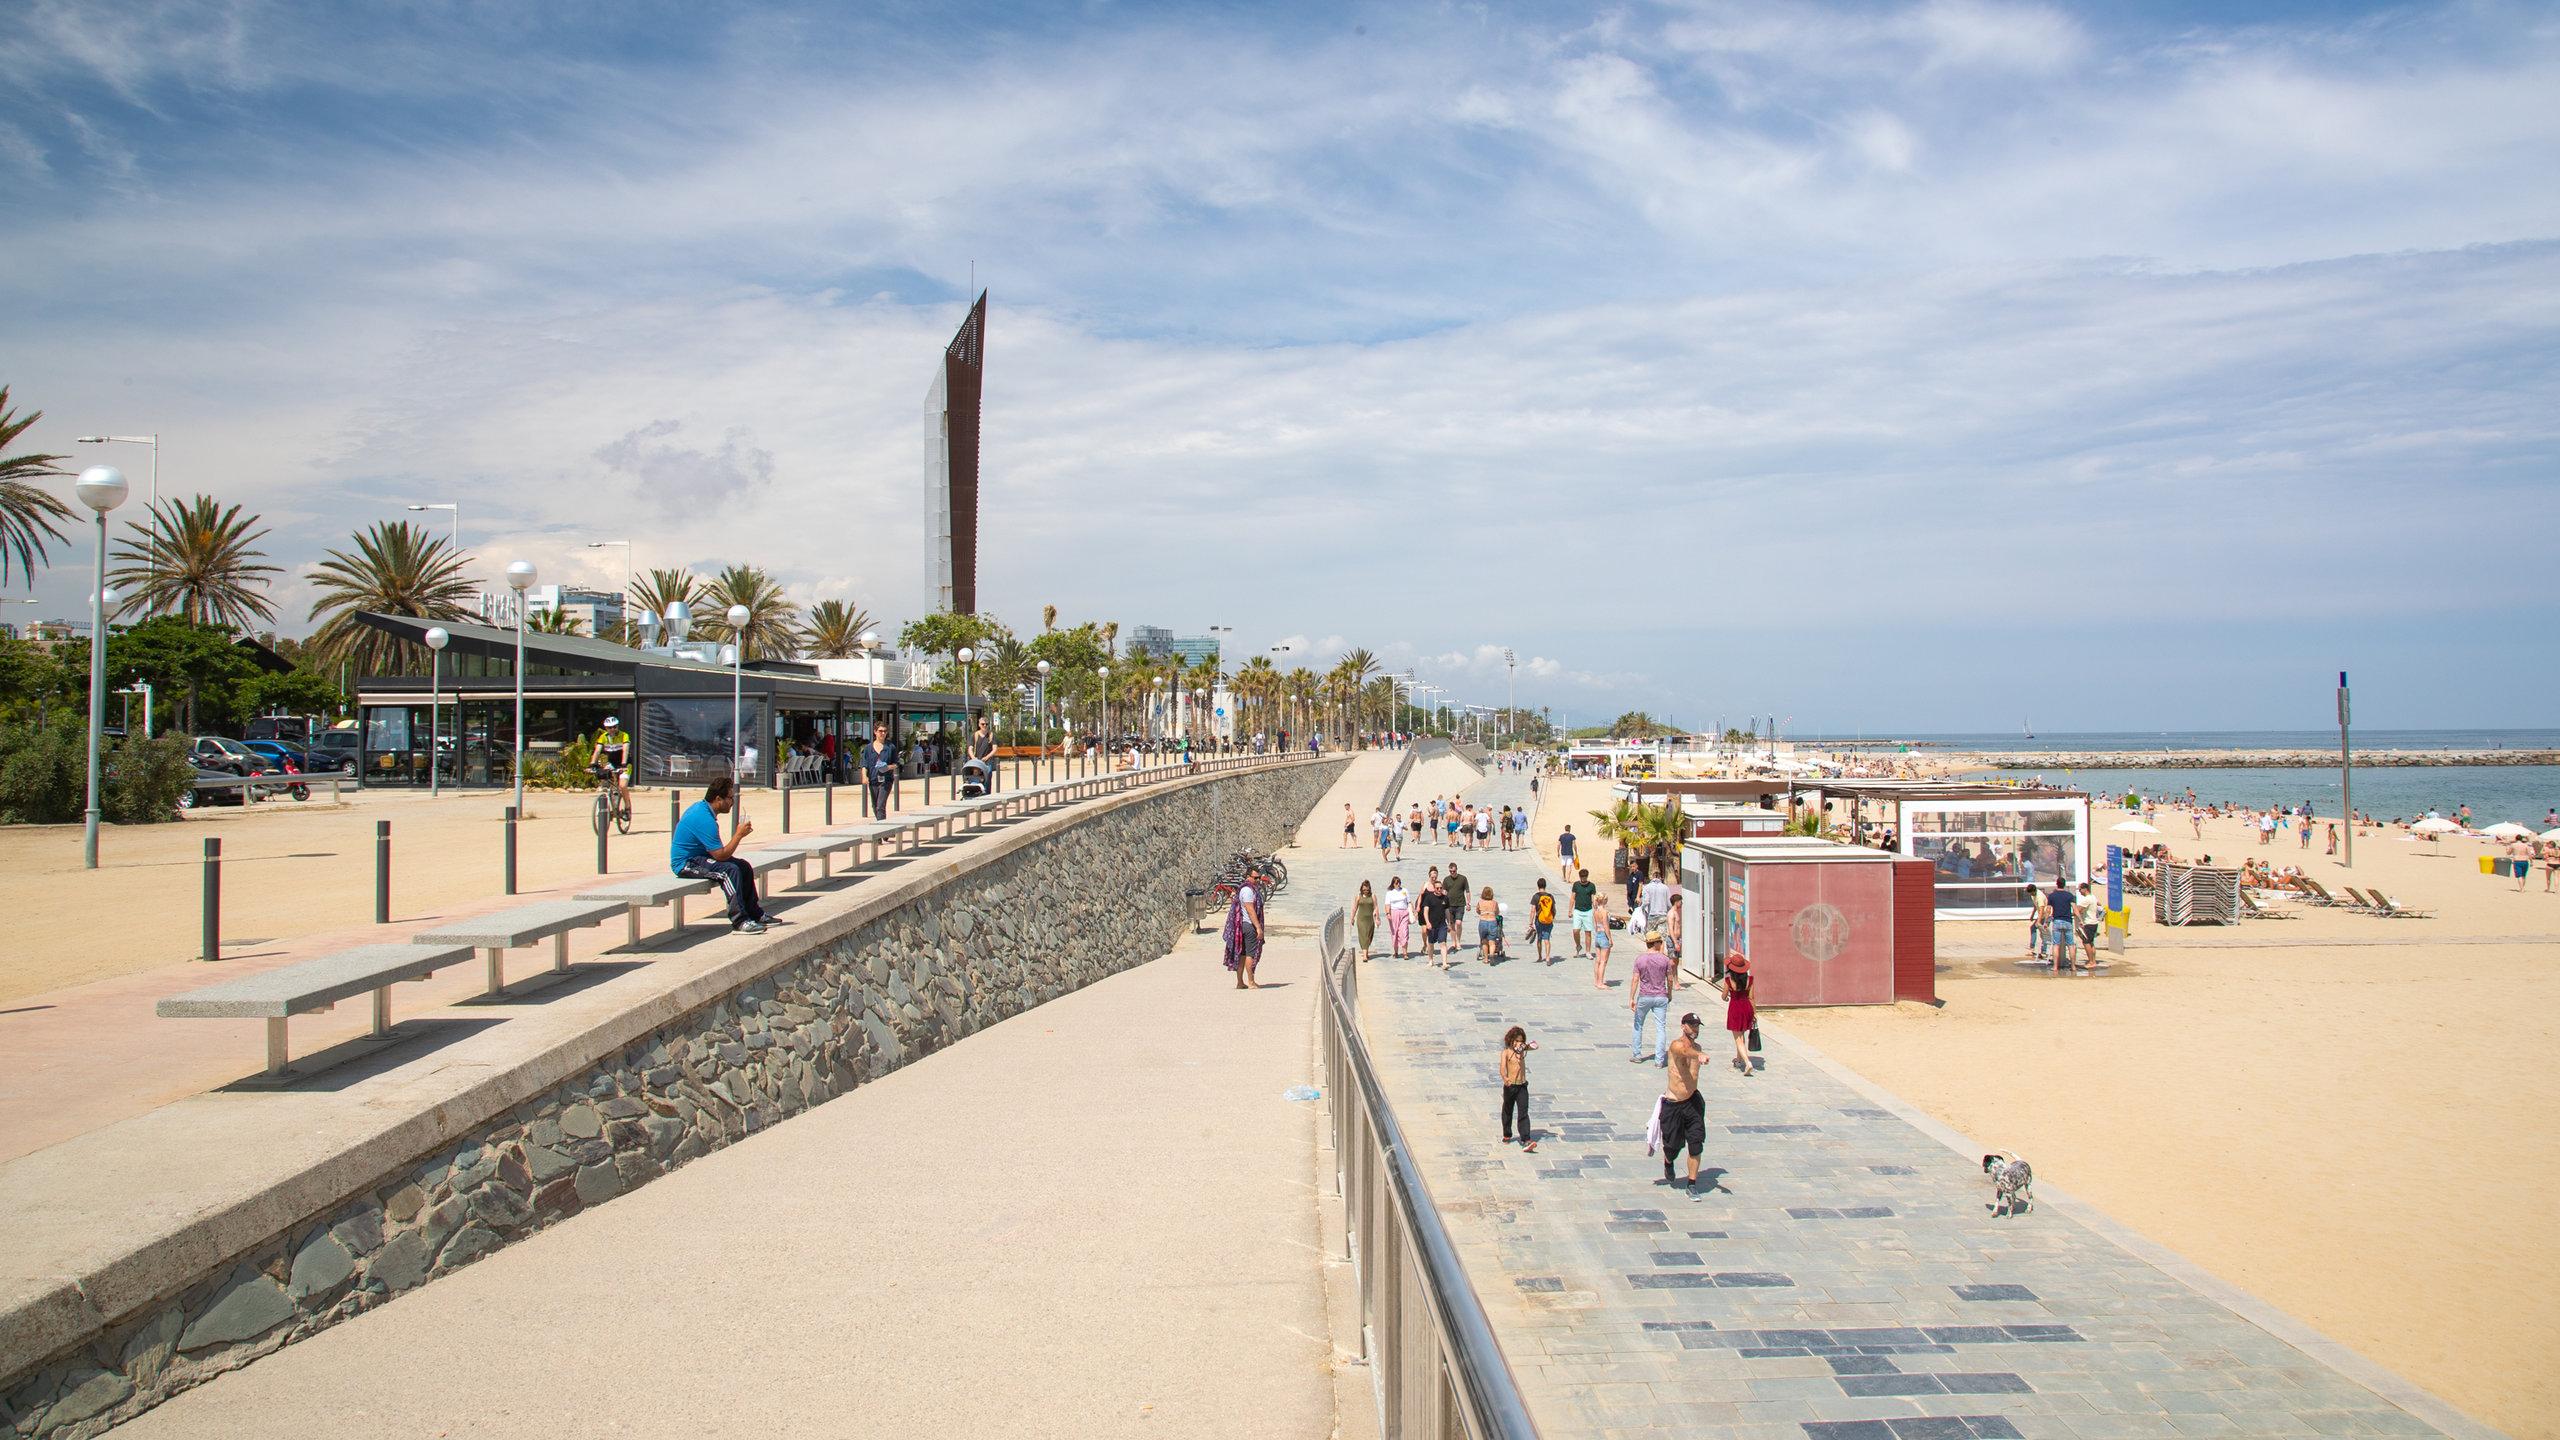 Playa Bogatell, Barcelona, Katalonien, Spanien